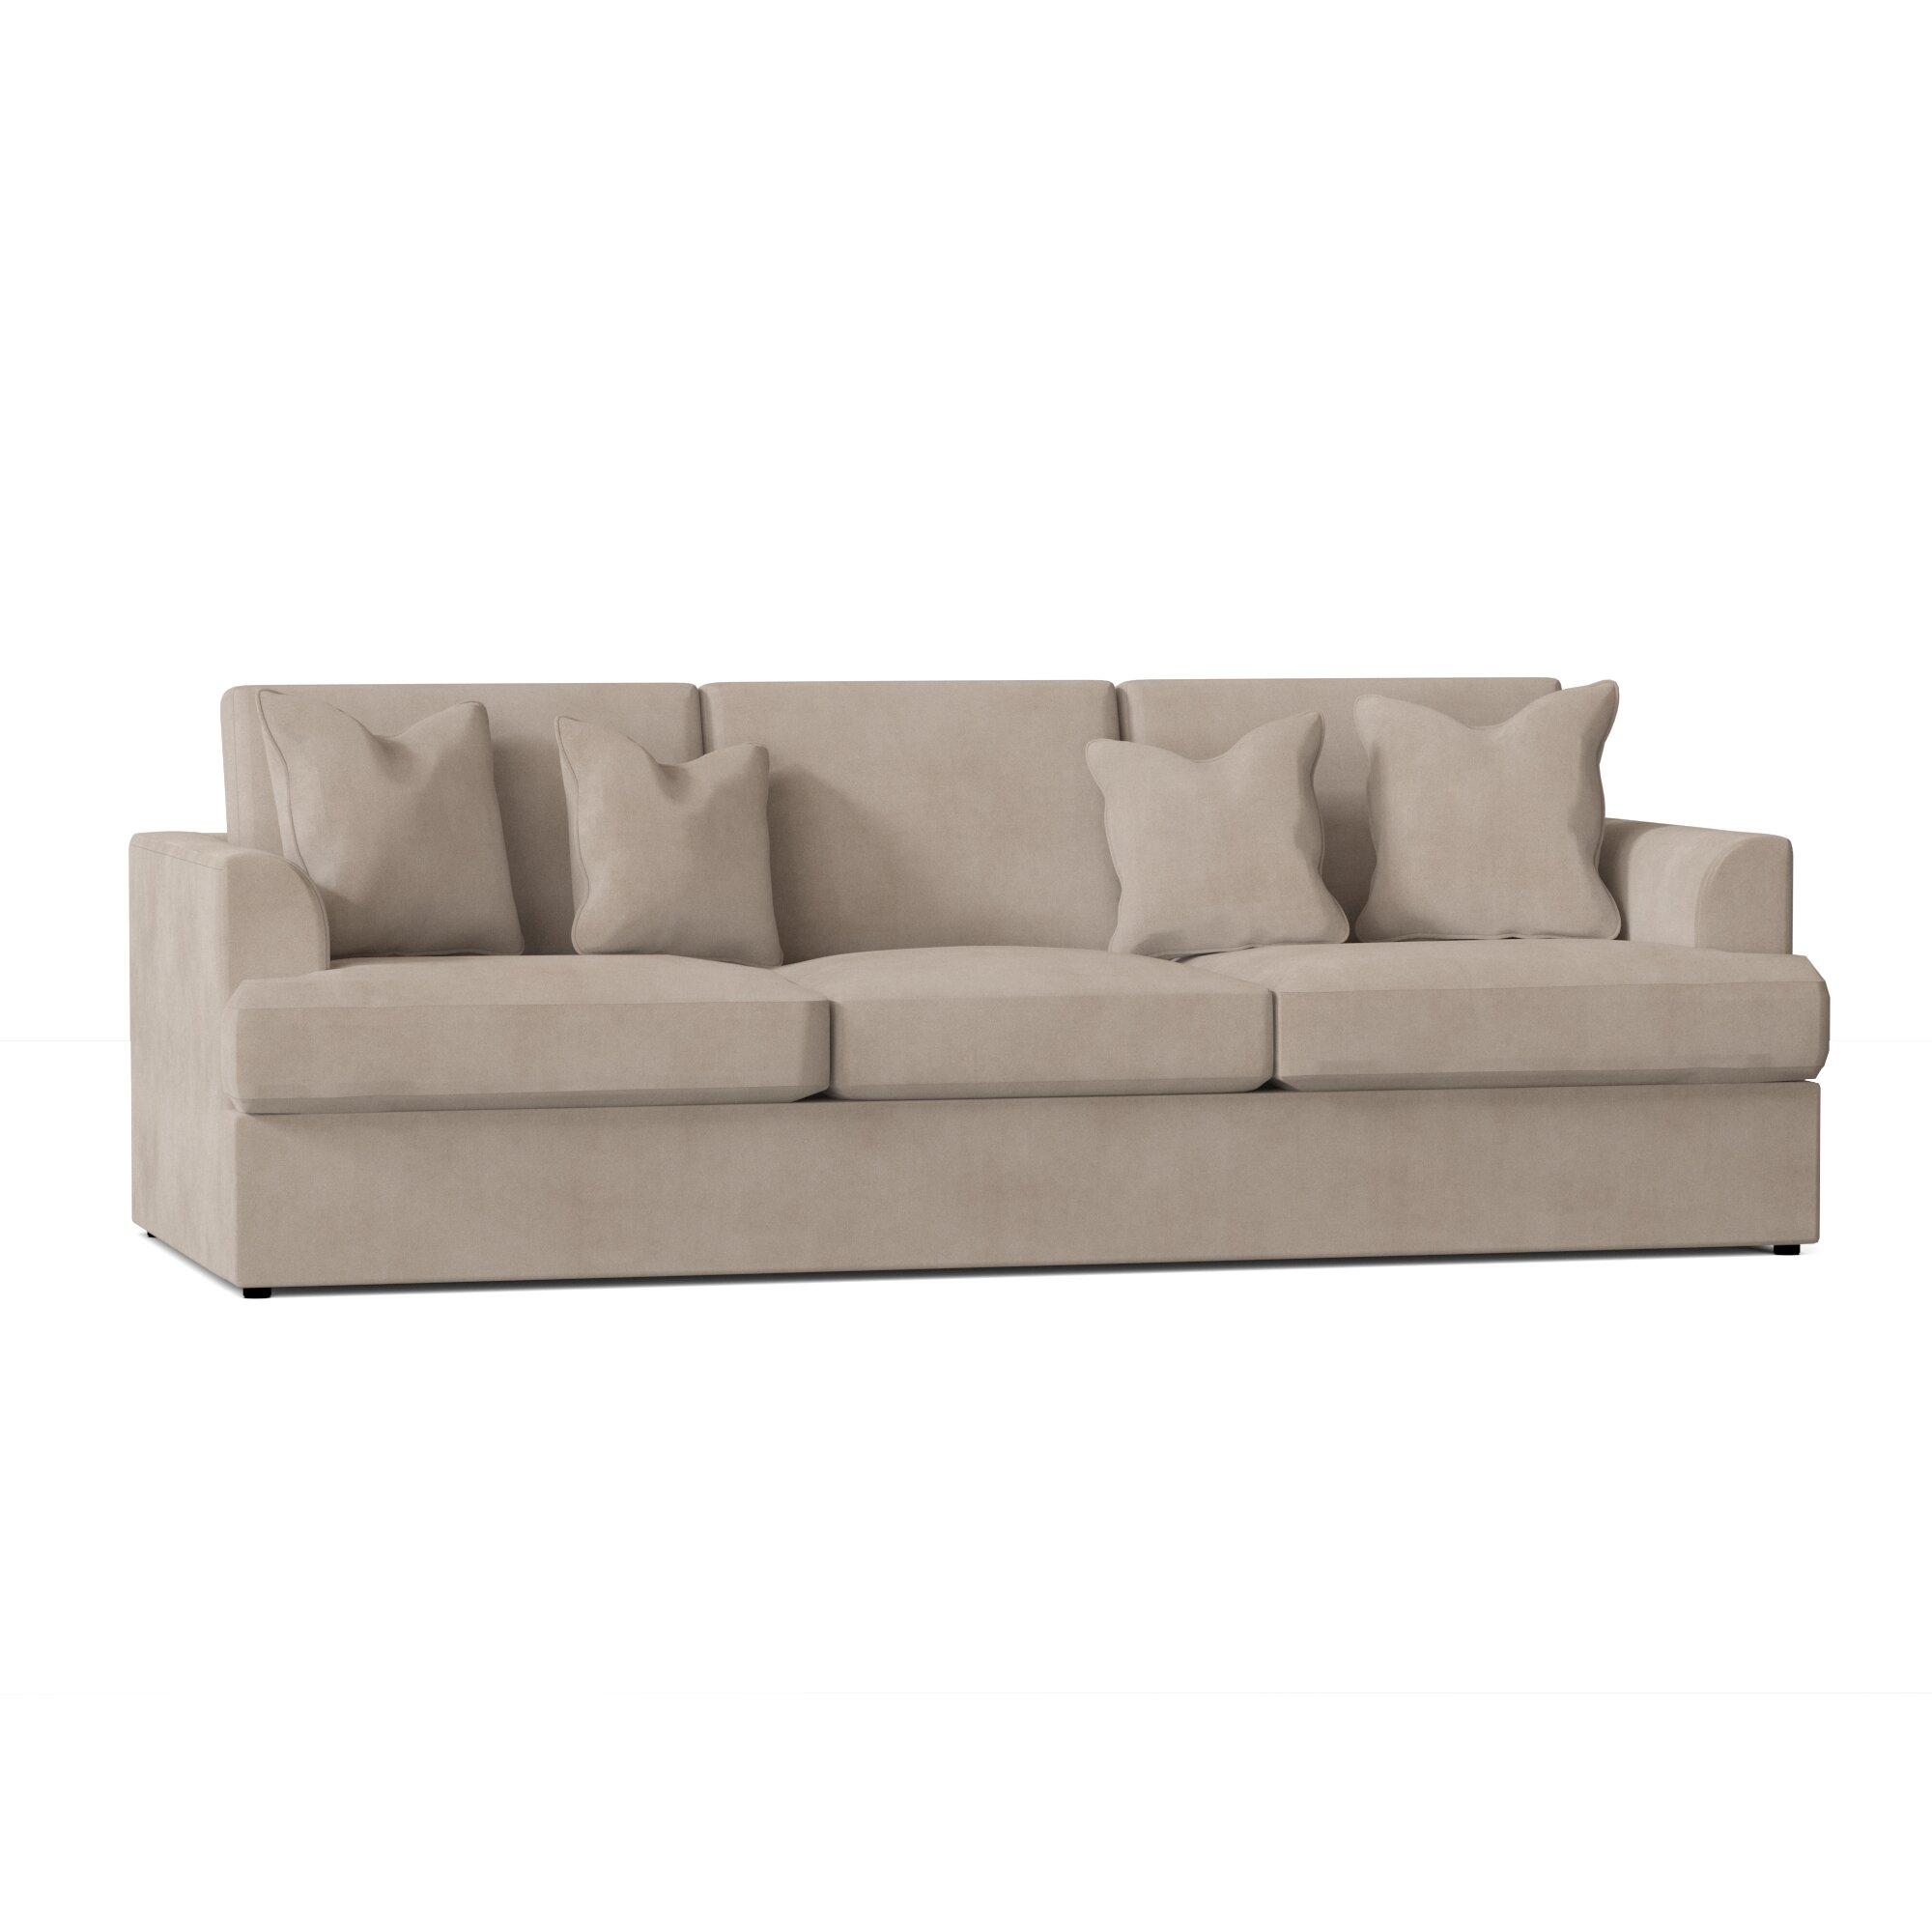 Wayfair Custom Upholstery Aubree 96 Recessed Arm Sofa Reviews Wayfair